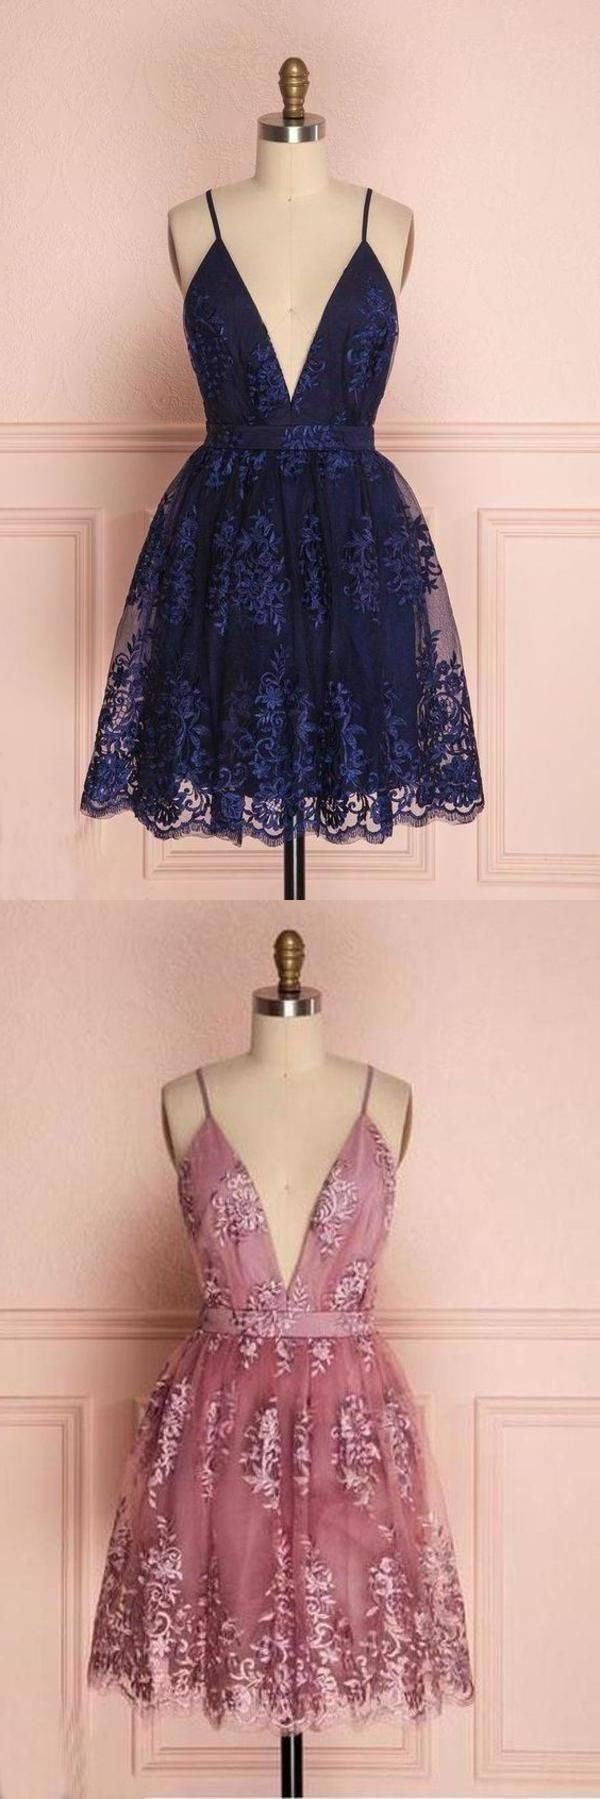 Navy Blue Deep V Neck Lace Spaghetti Straps Homecoming Dresses Short Prom Dresses